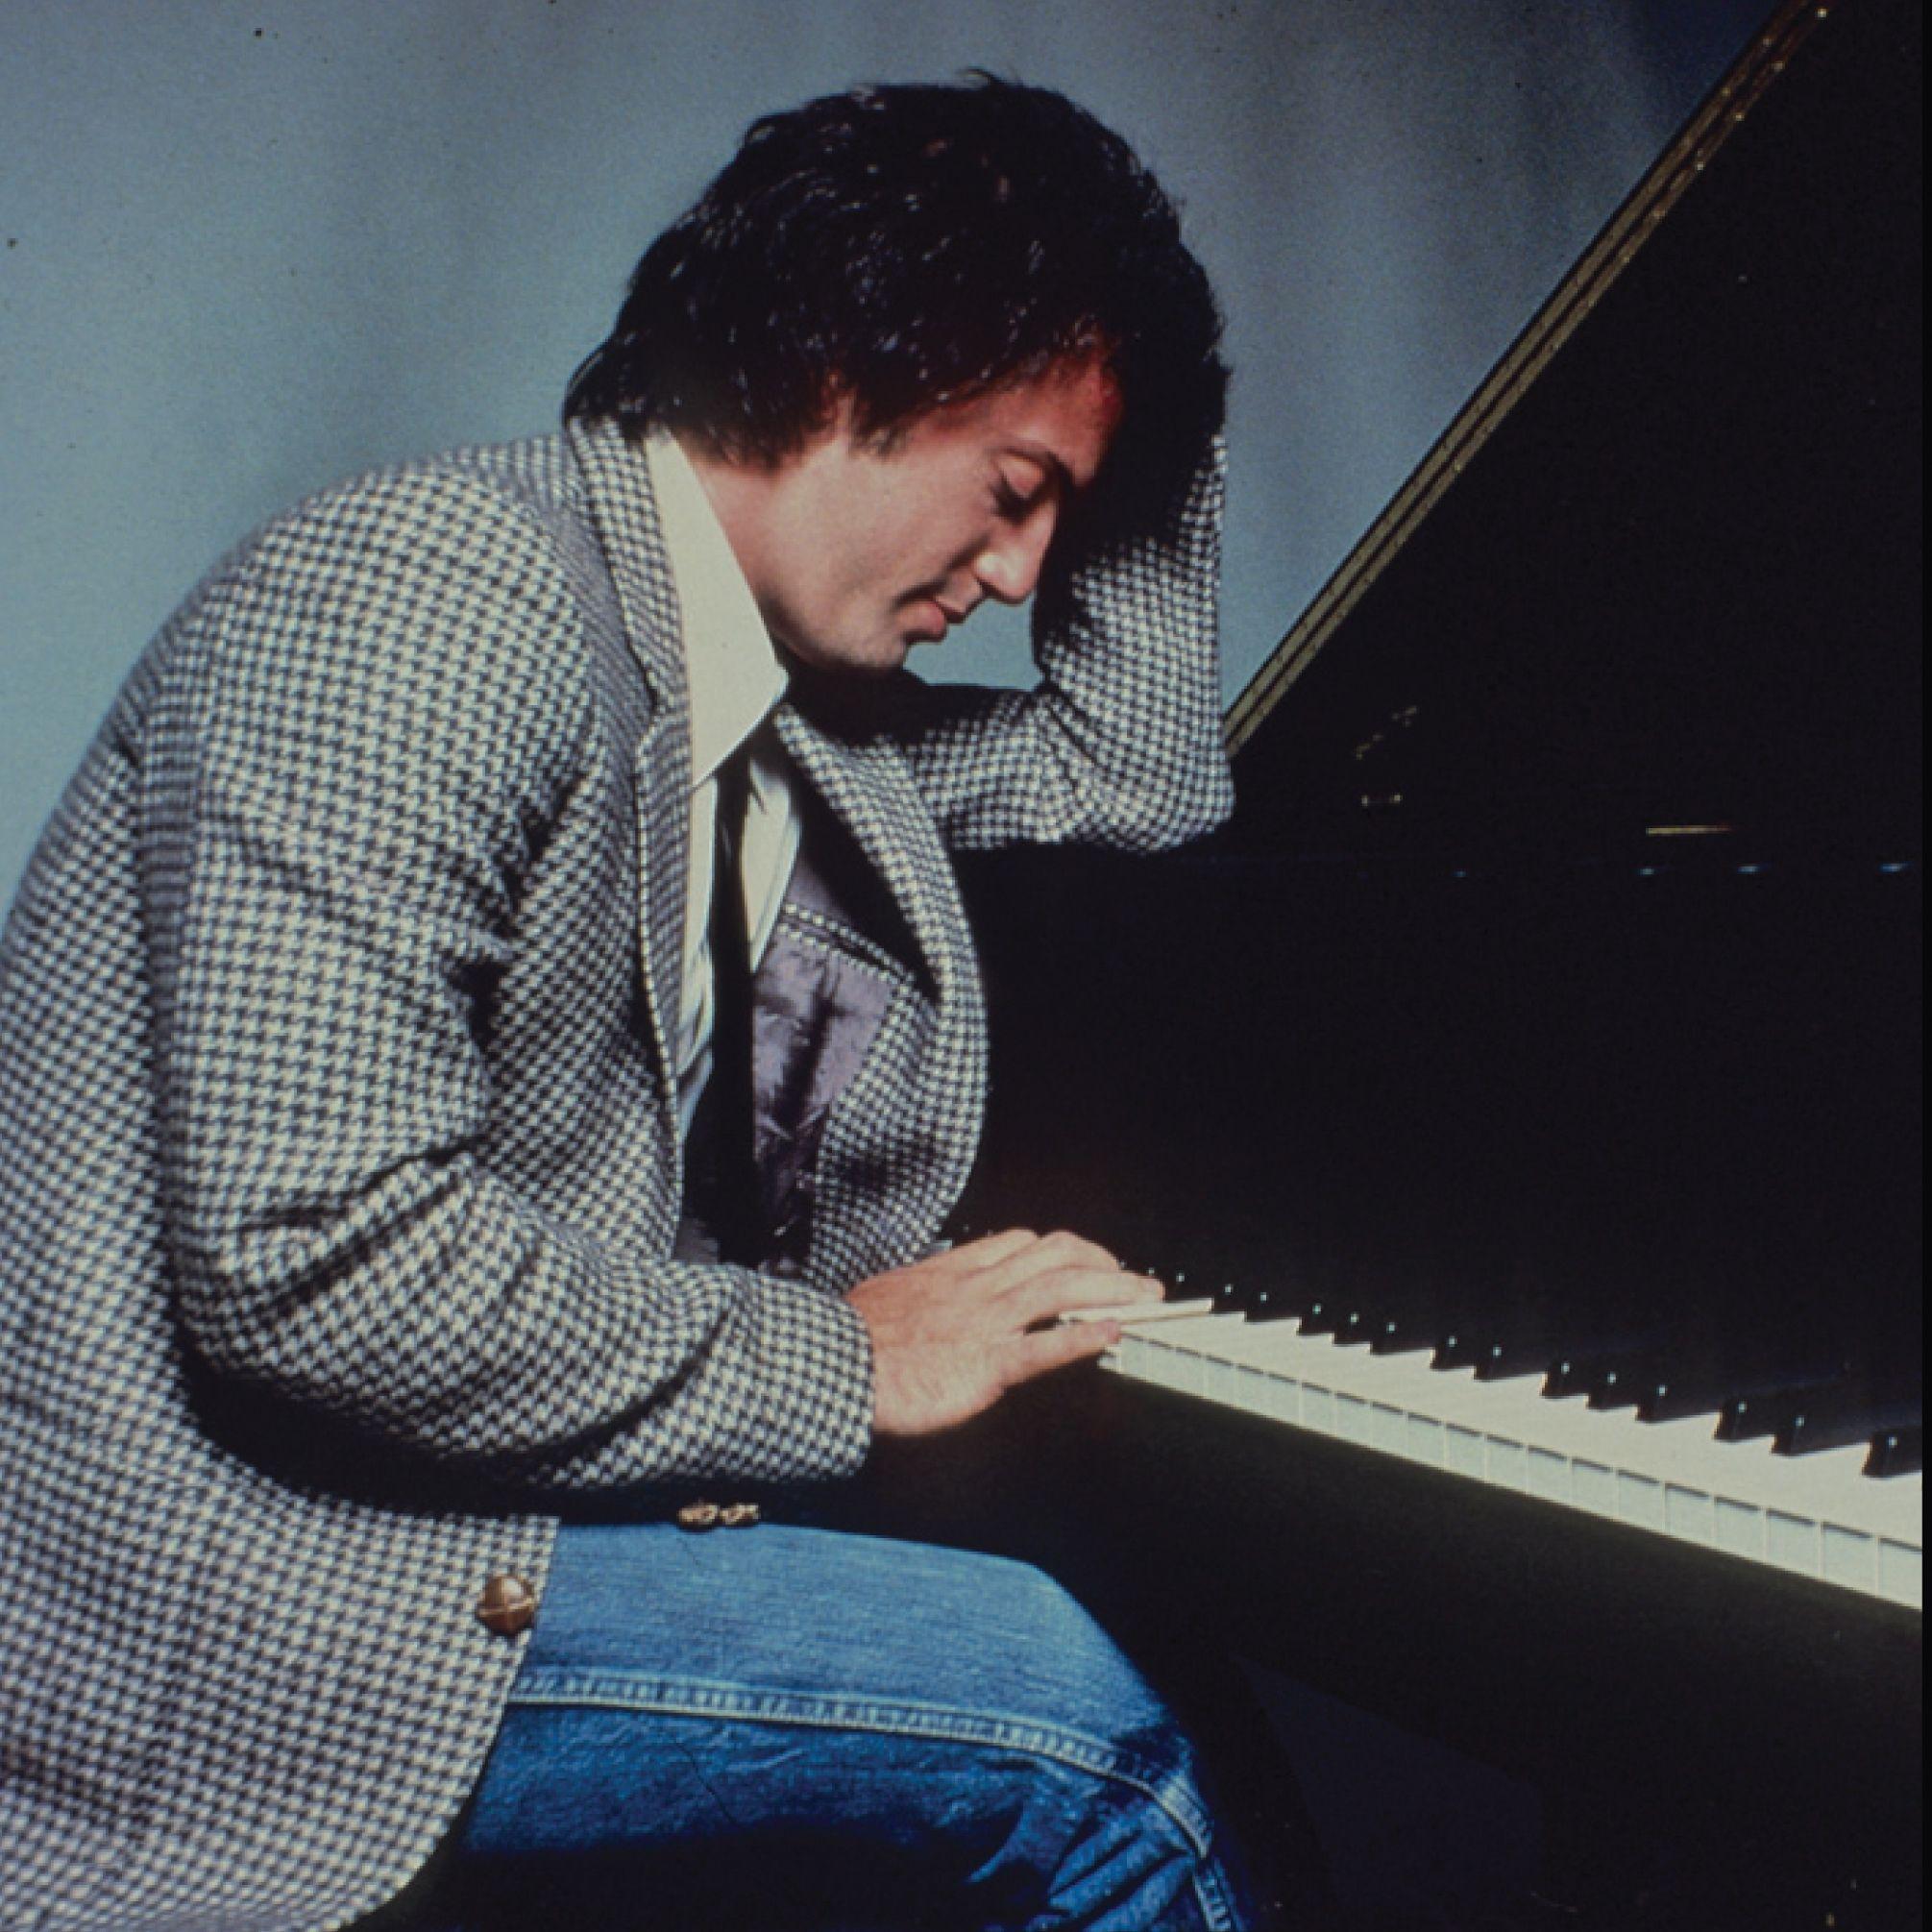 billy joel playing piano - photo #33